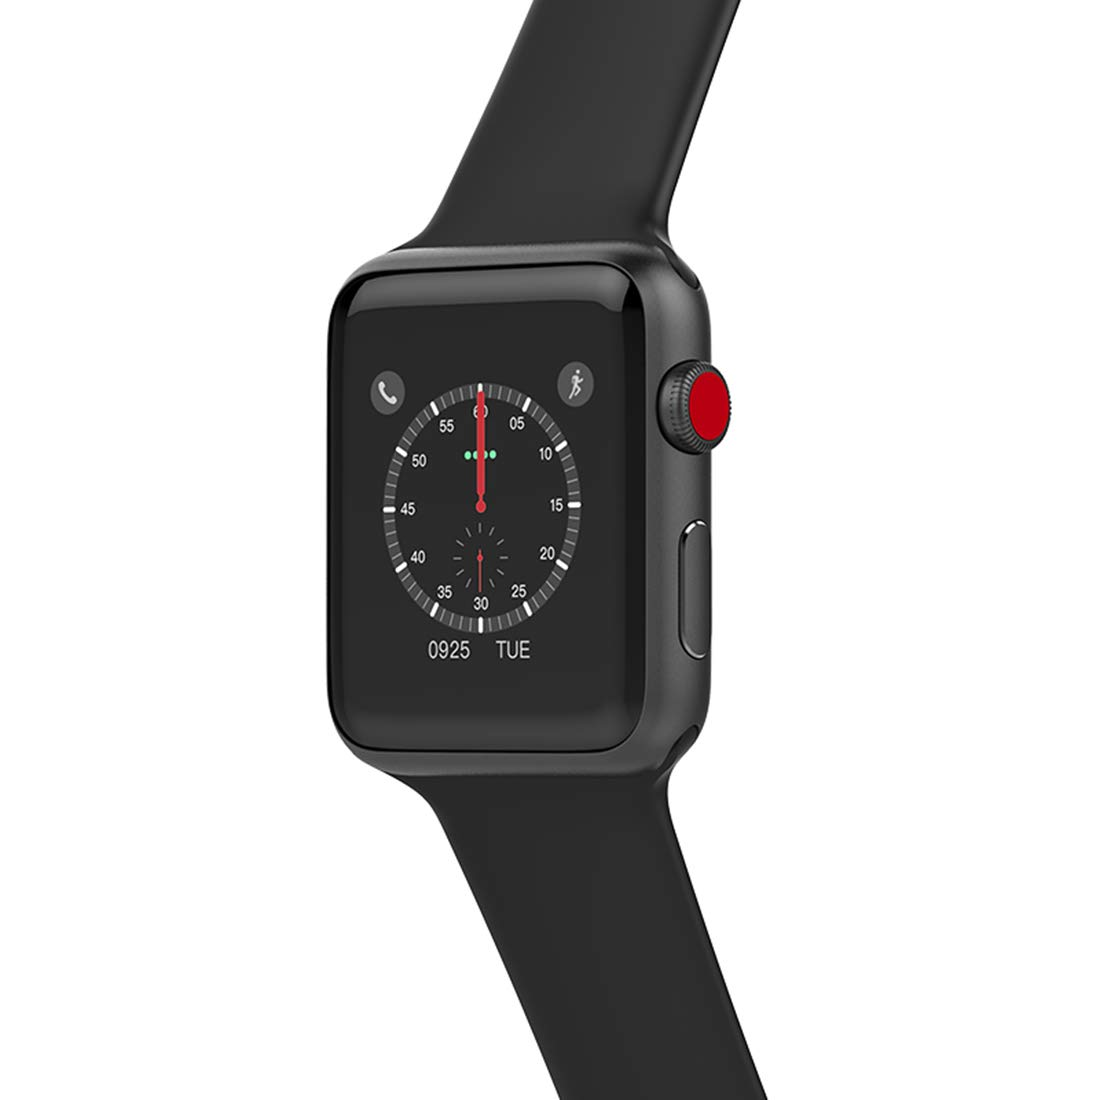 Smart watch W53 Bluetooth Series 3 Smartwatch Estuche para Apple iOS iPhone Android Phone Deporte Pulsera Fitness Reloj De Pulsera,Aluminumblack